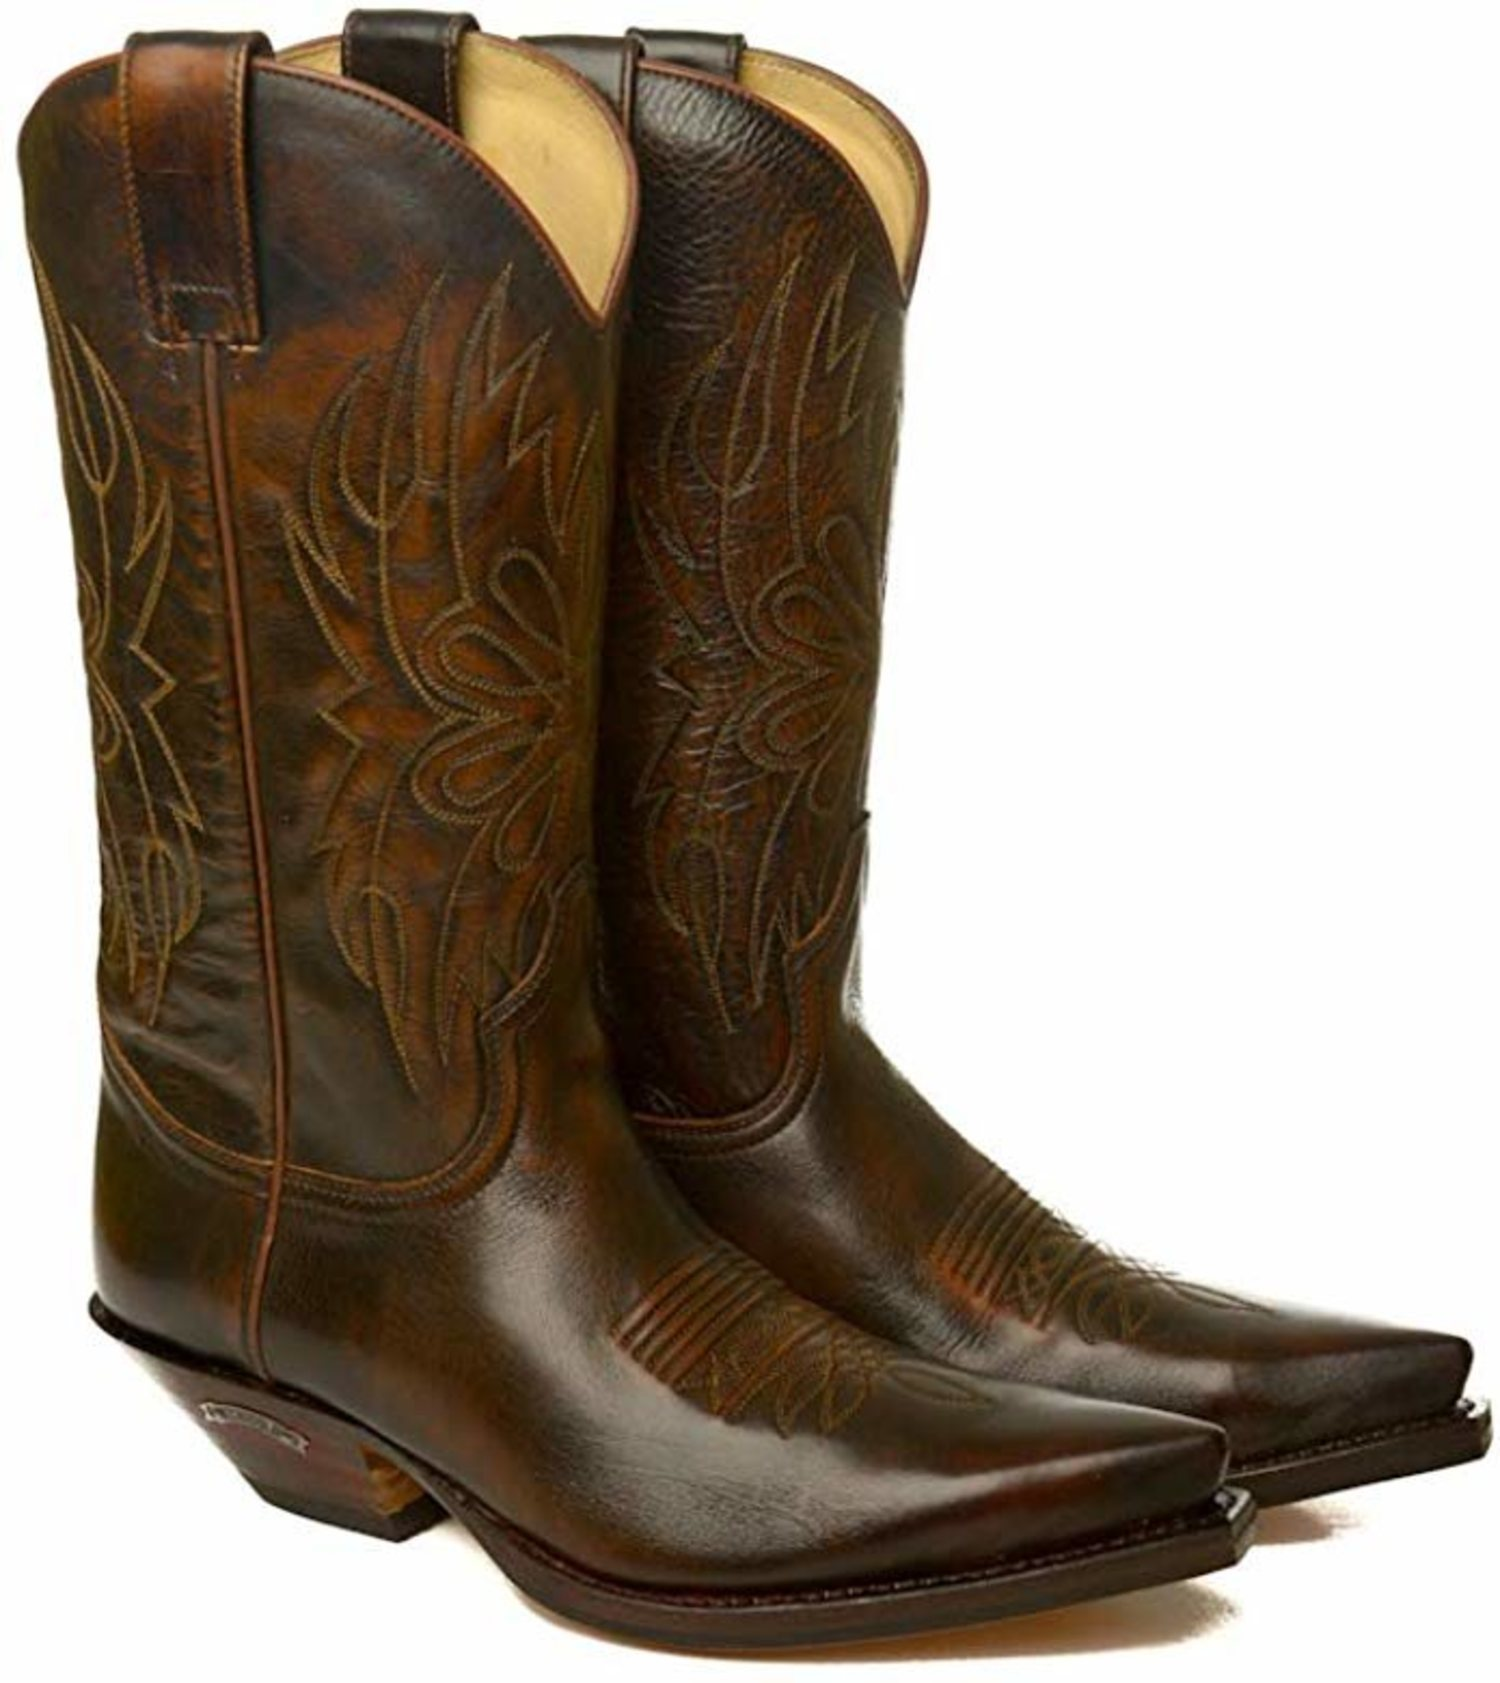 Botas cowboy Amazon.